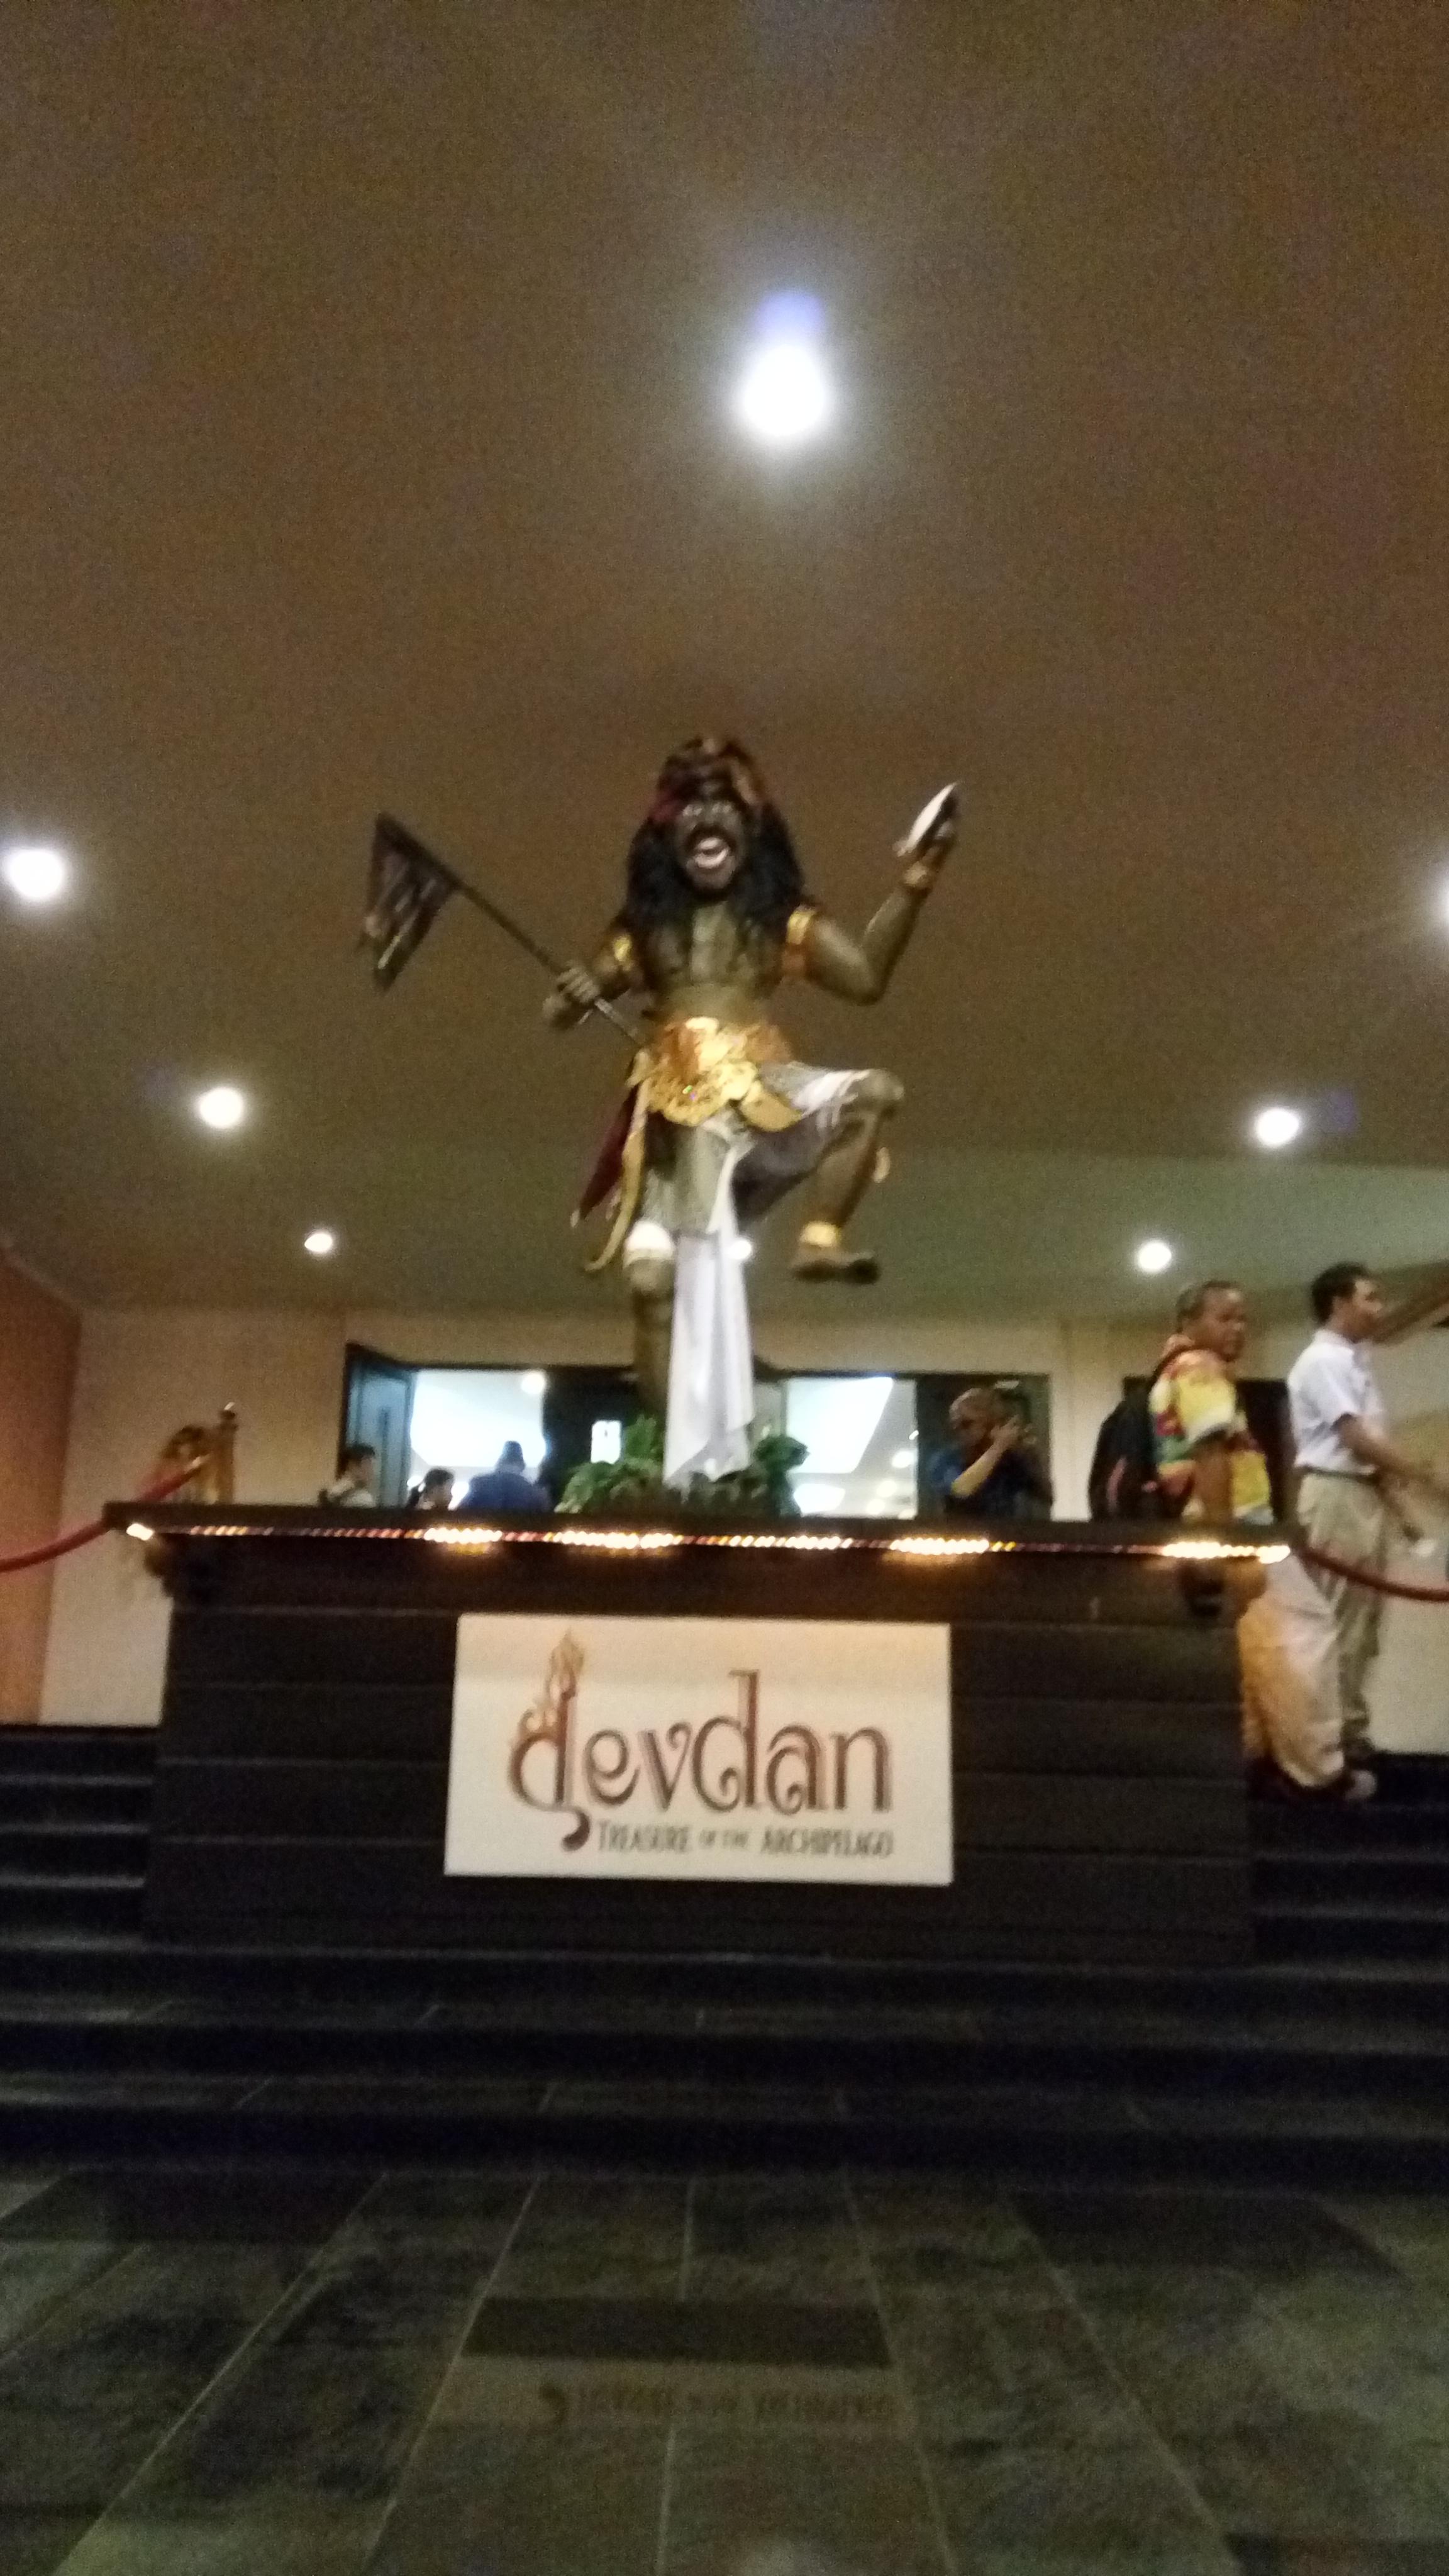 Devdan Show, Nusa Dua, Bali